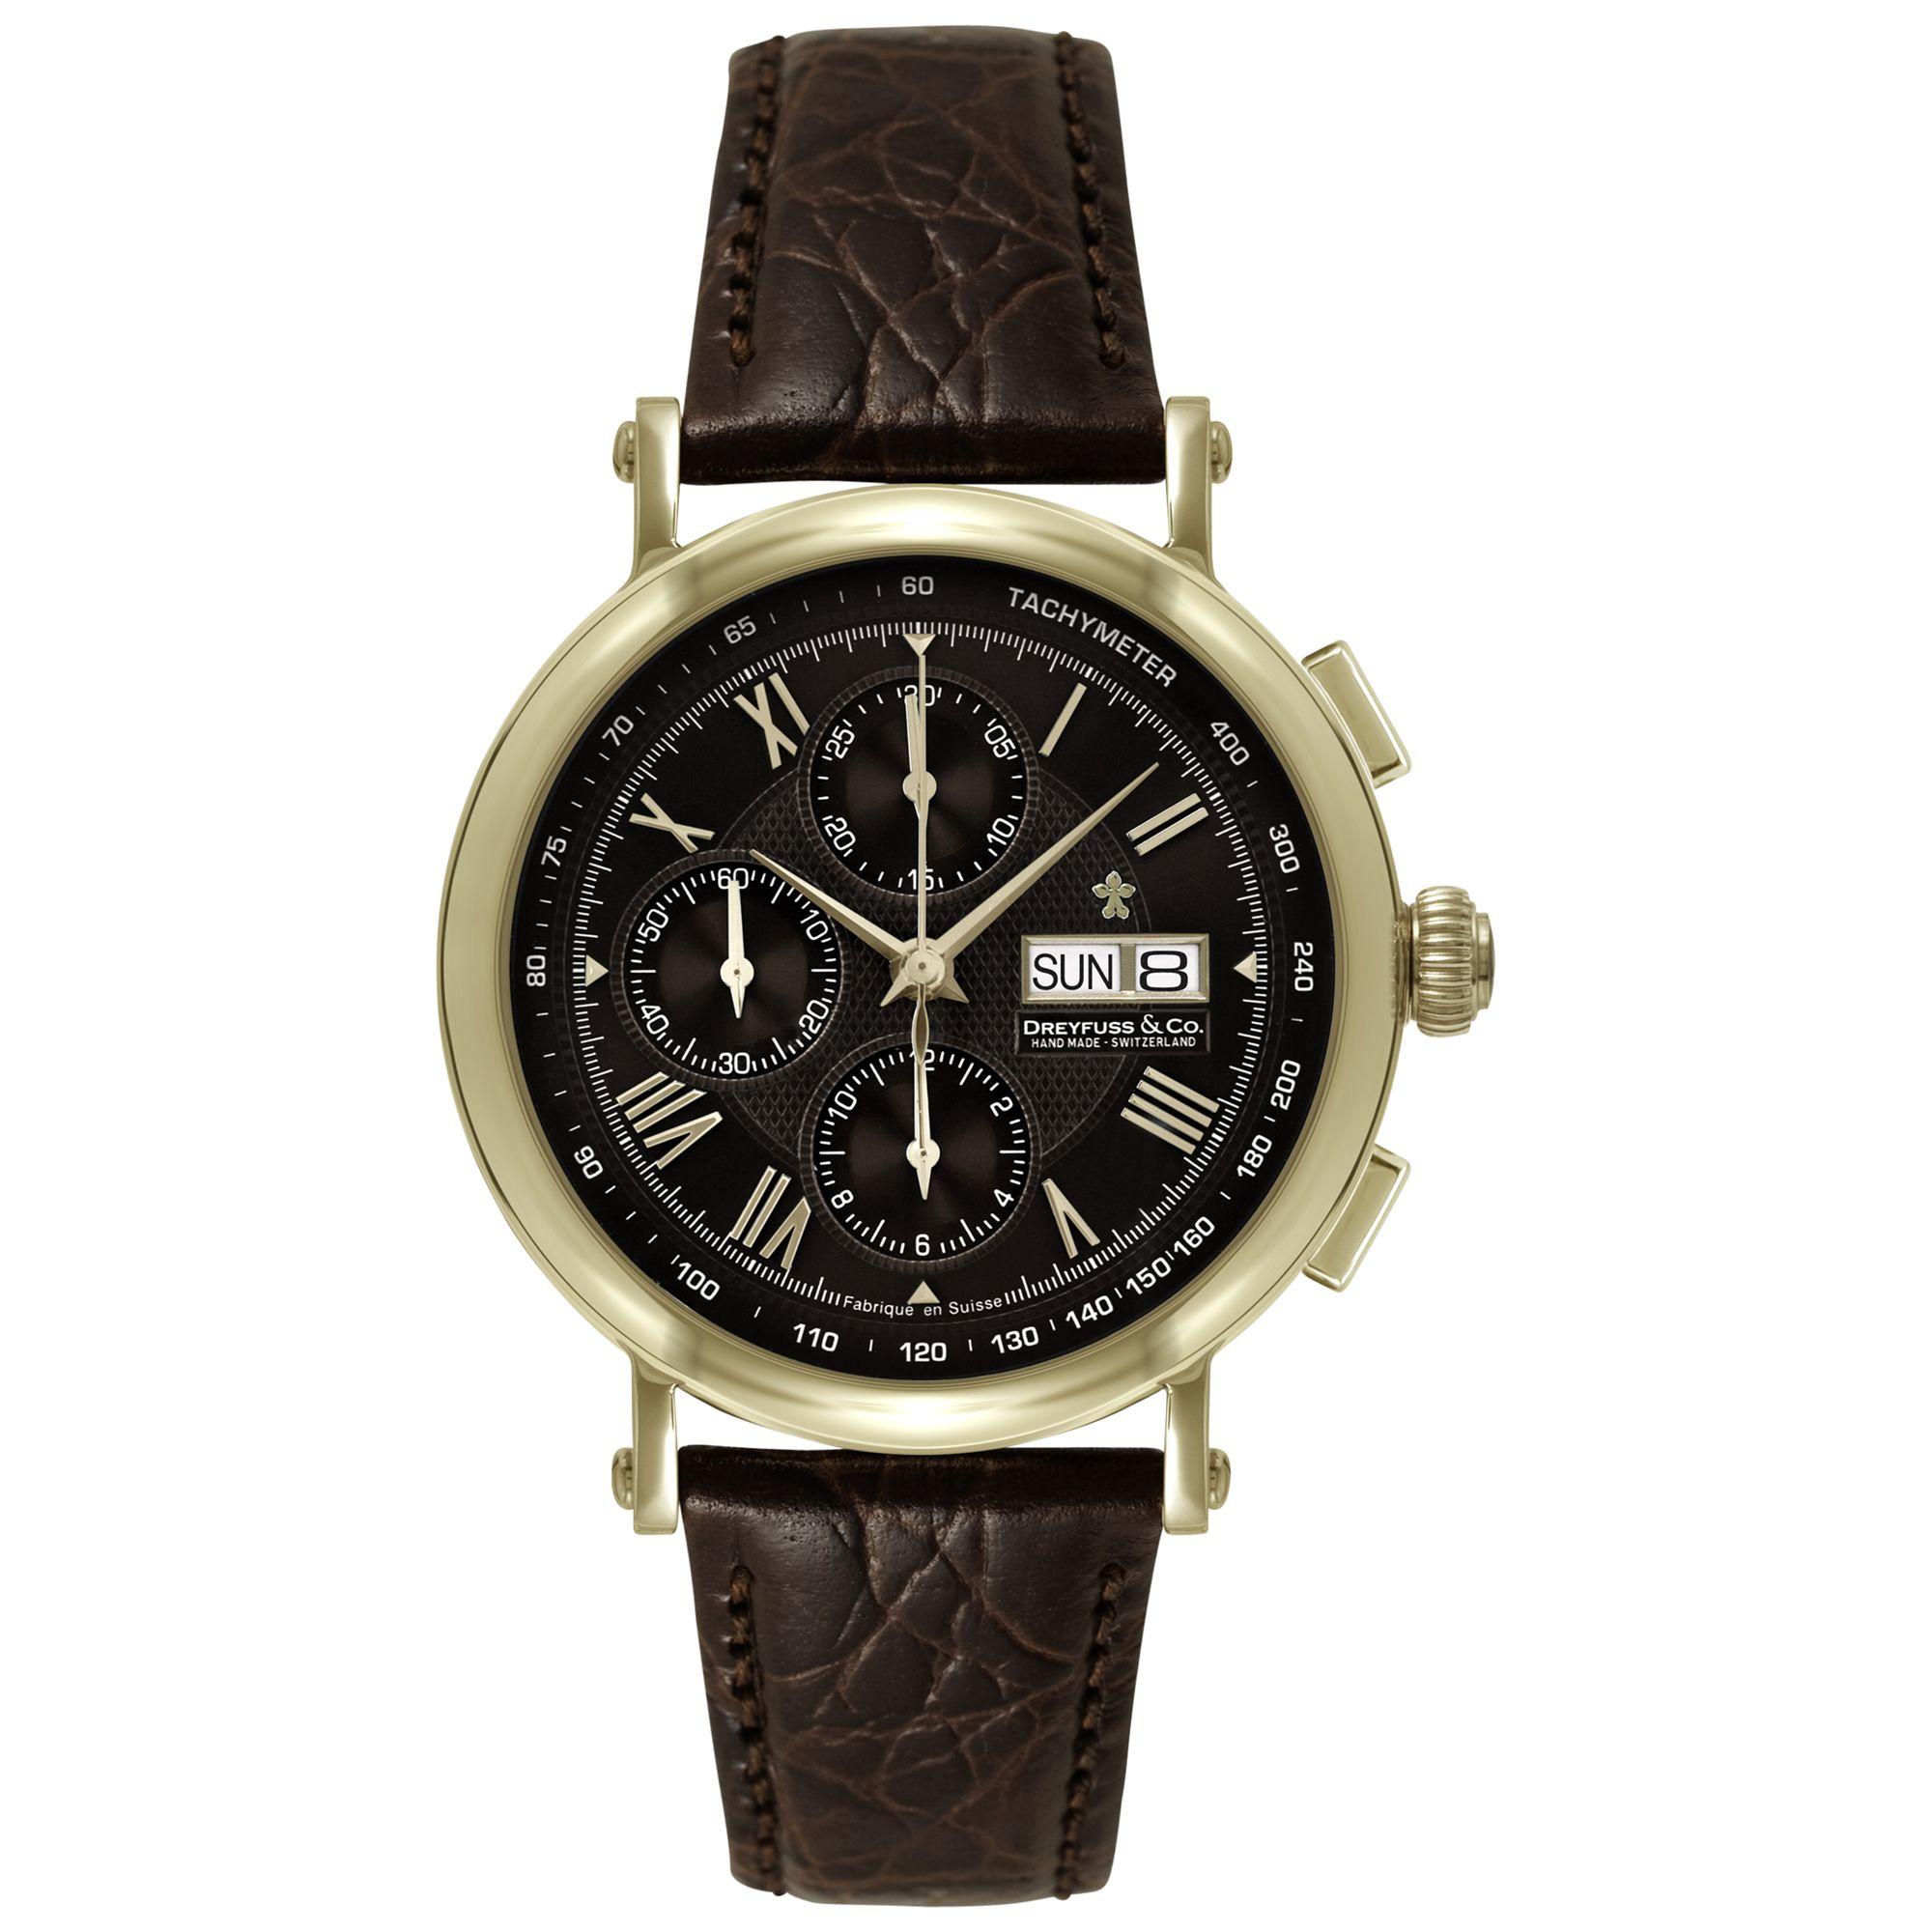 Dreyfuss & Co Dreyfuss & Co DGS00051/16 Men's 1926 Automatic Chronograph Leather Strap Watch, Brown/Black